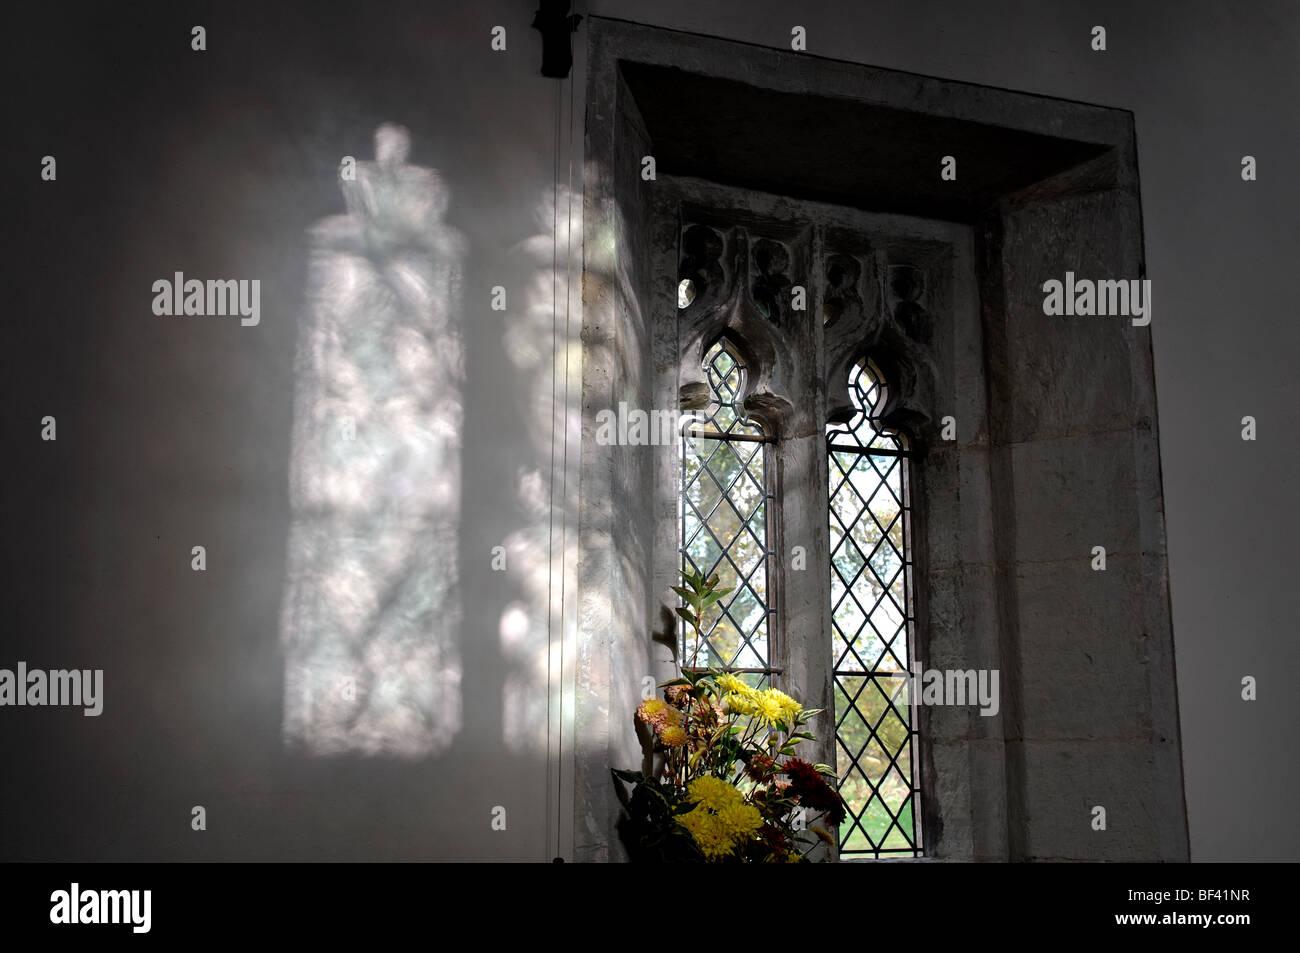 Diffuse light on wall from windows, St. Michael`s Church, Baddesley Clinton, Warwickshire, England, UK - Stock Image